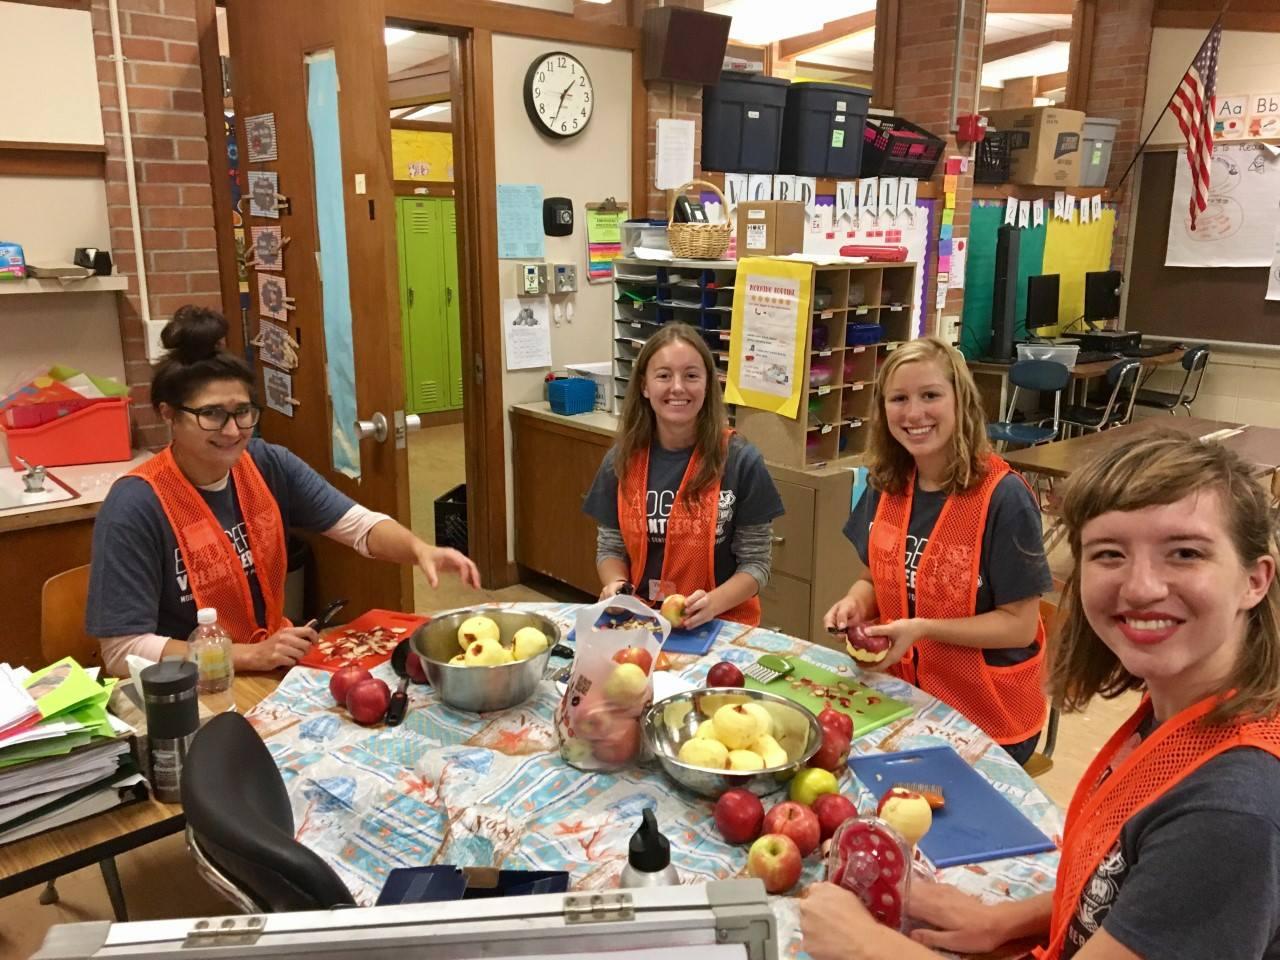 Gillian McBride (far right) at Lakeview Elementary as a Badger Volunteer Team Leader.